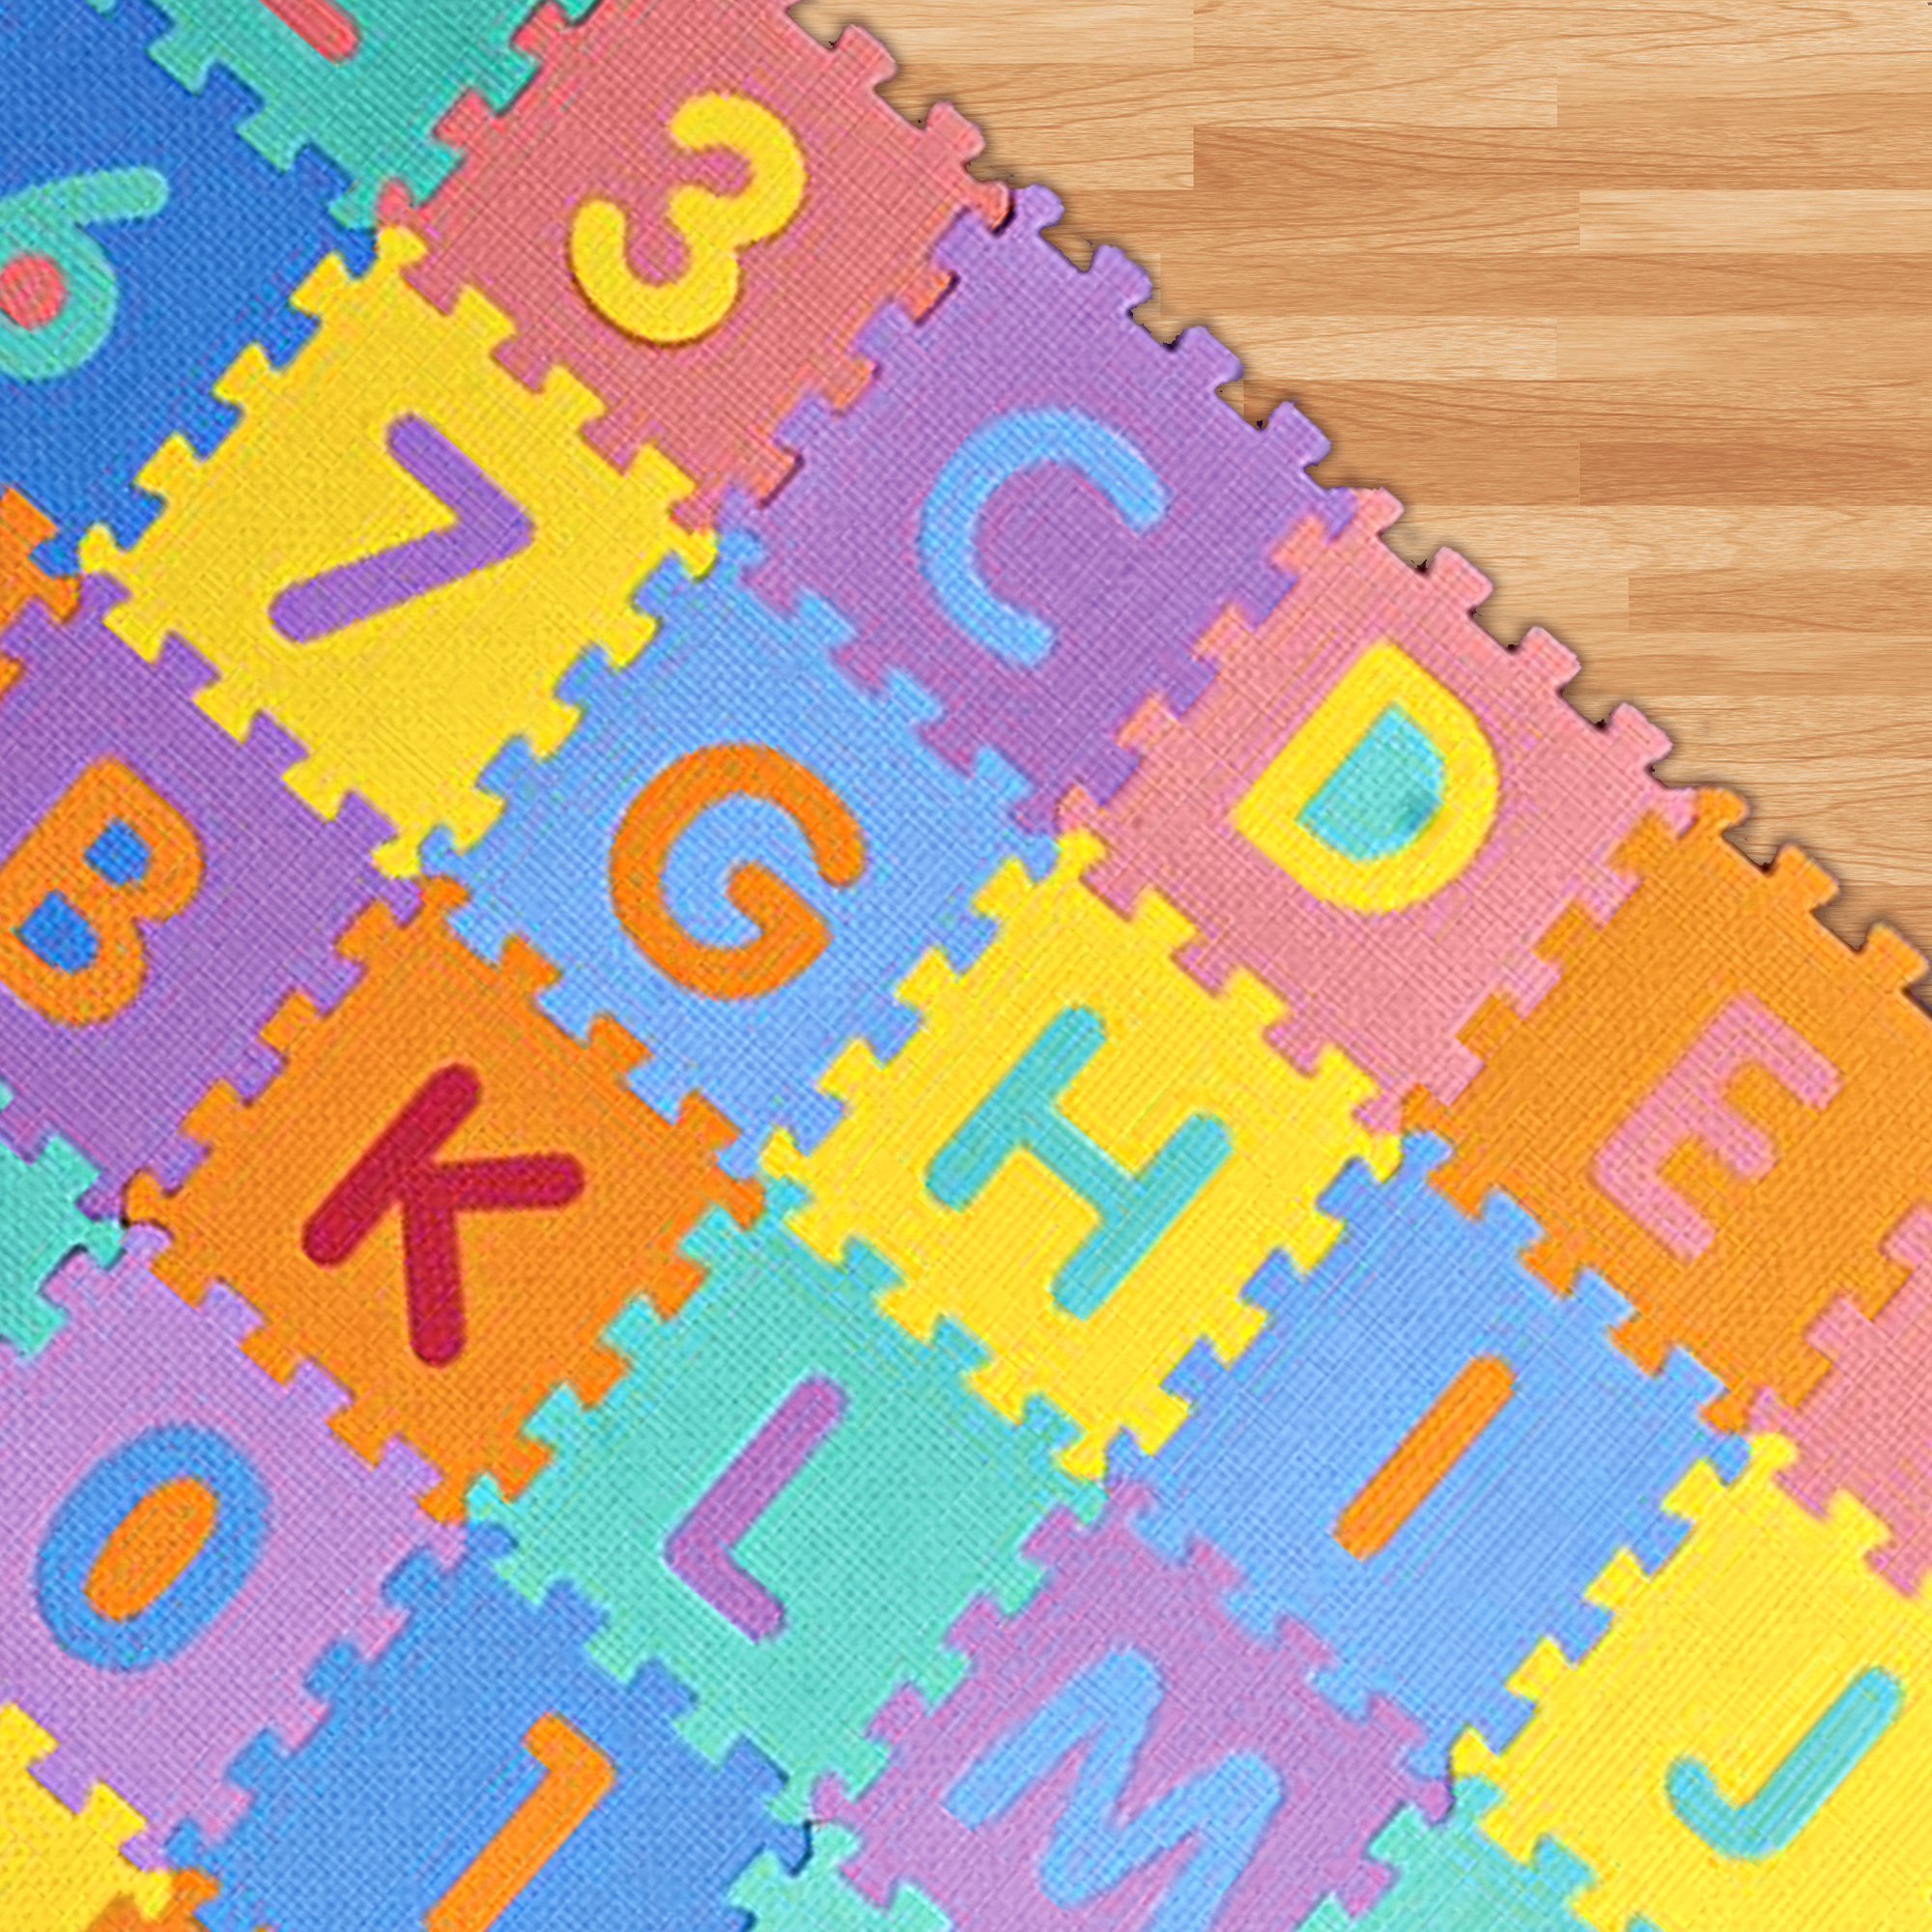 IAG-Educational-Soft-Mat-Floor-Puzzle-Lifestyle2